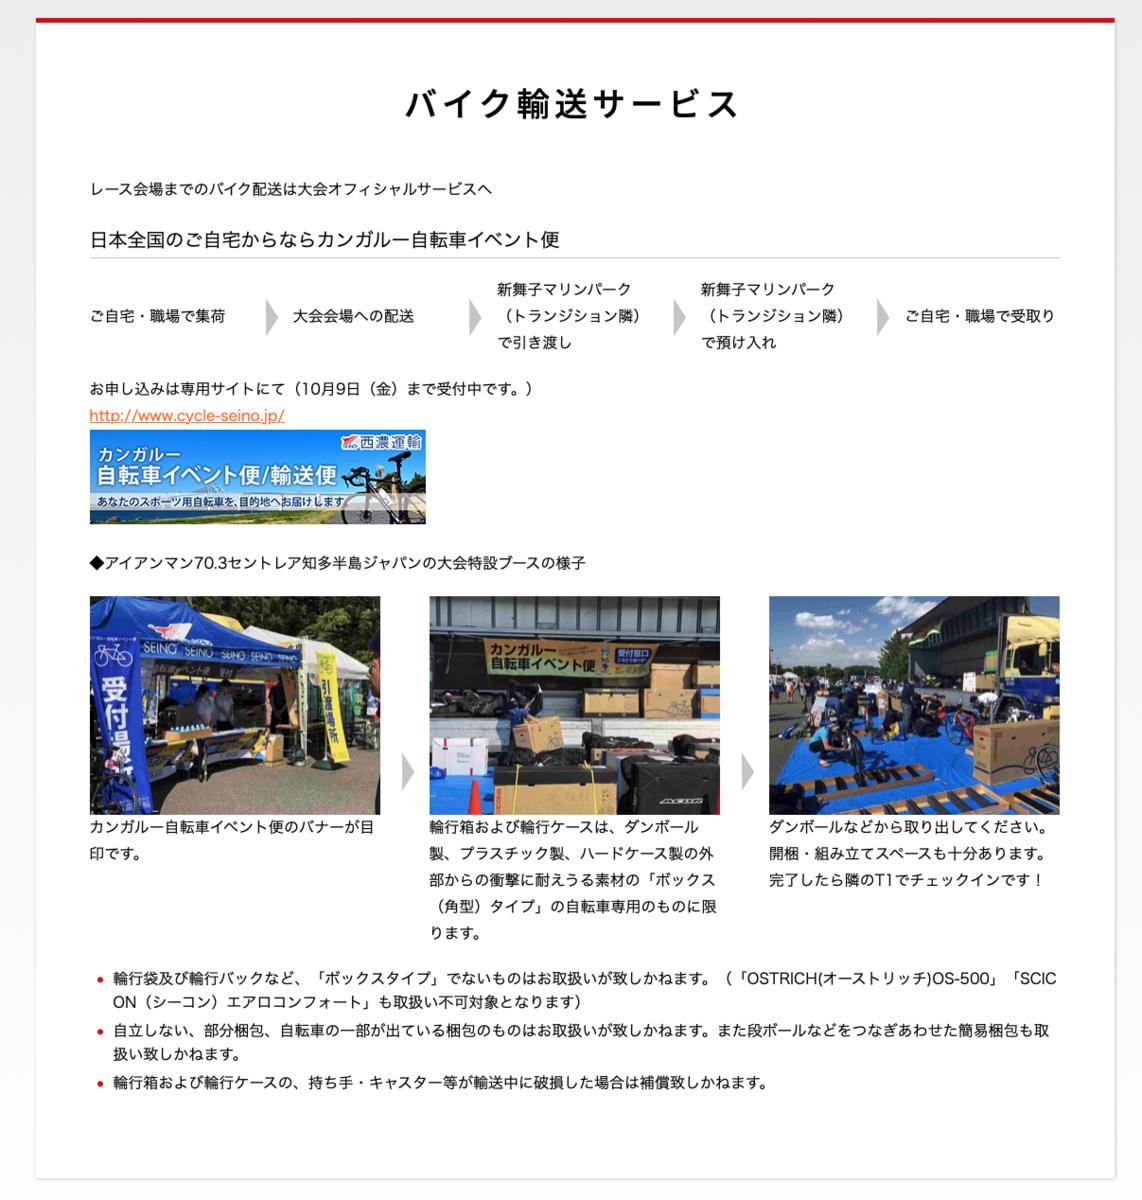 f:id:jwatanabe:20201013082008p:plain